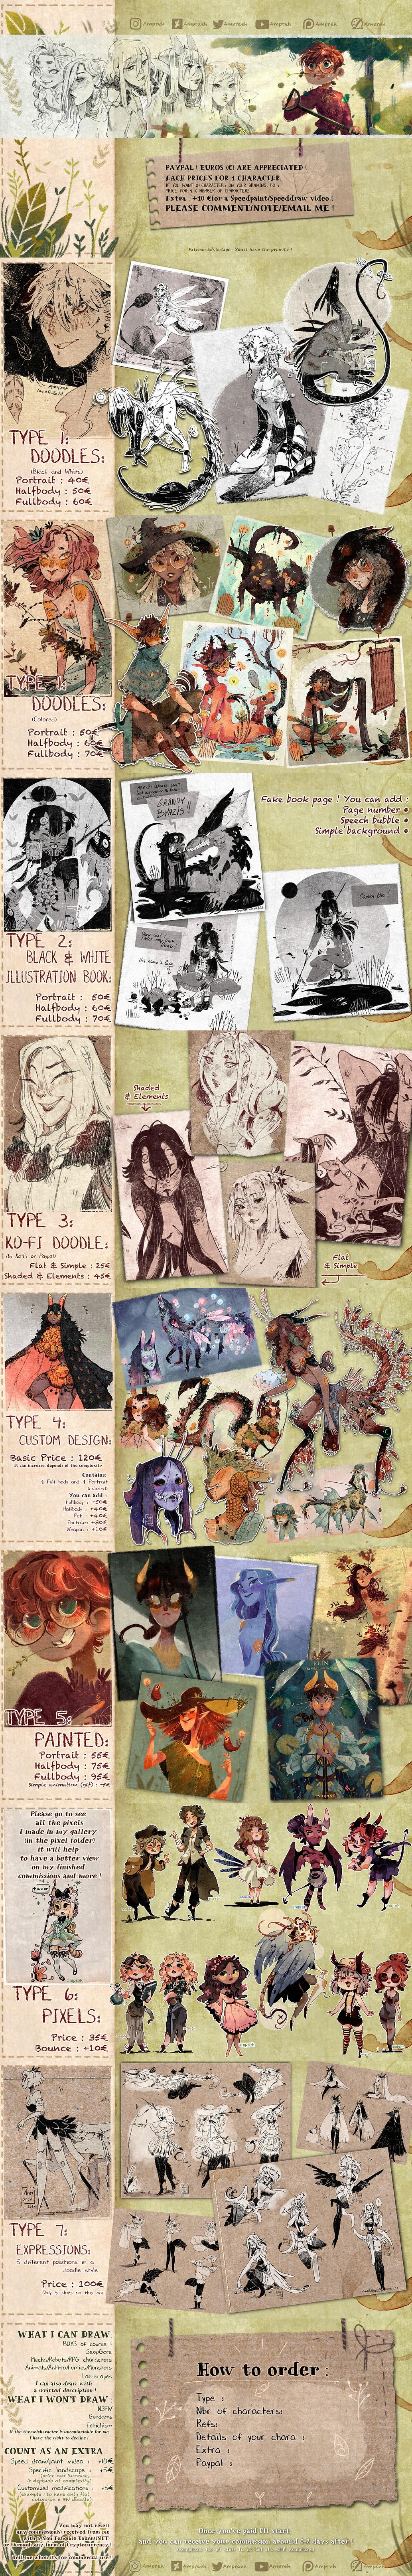 Ampreh's Commissions.jpg